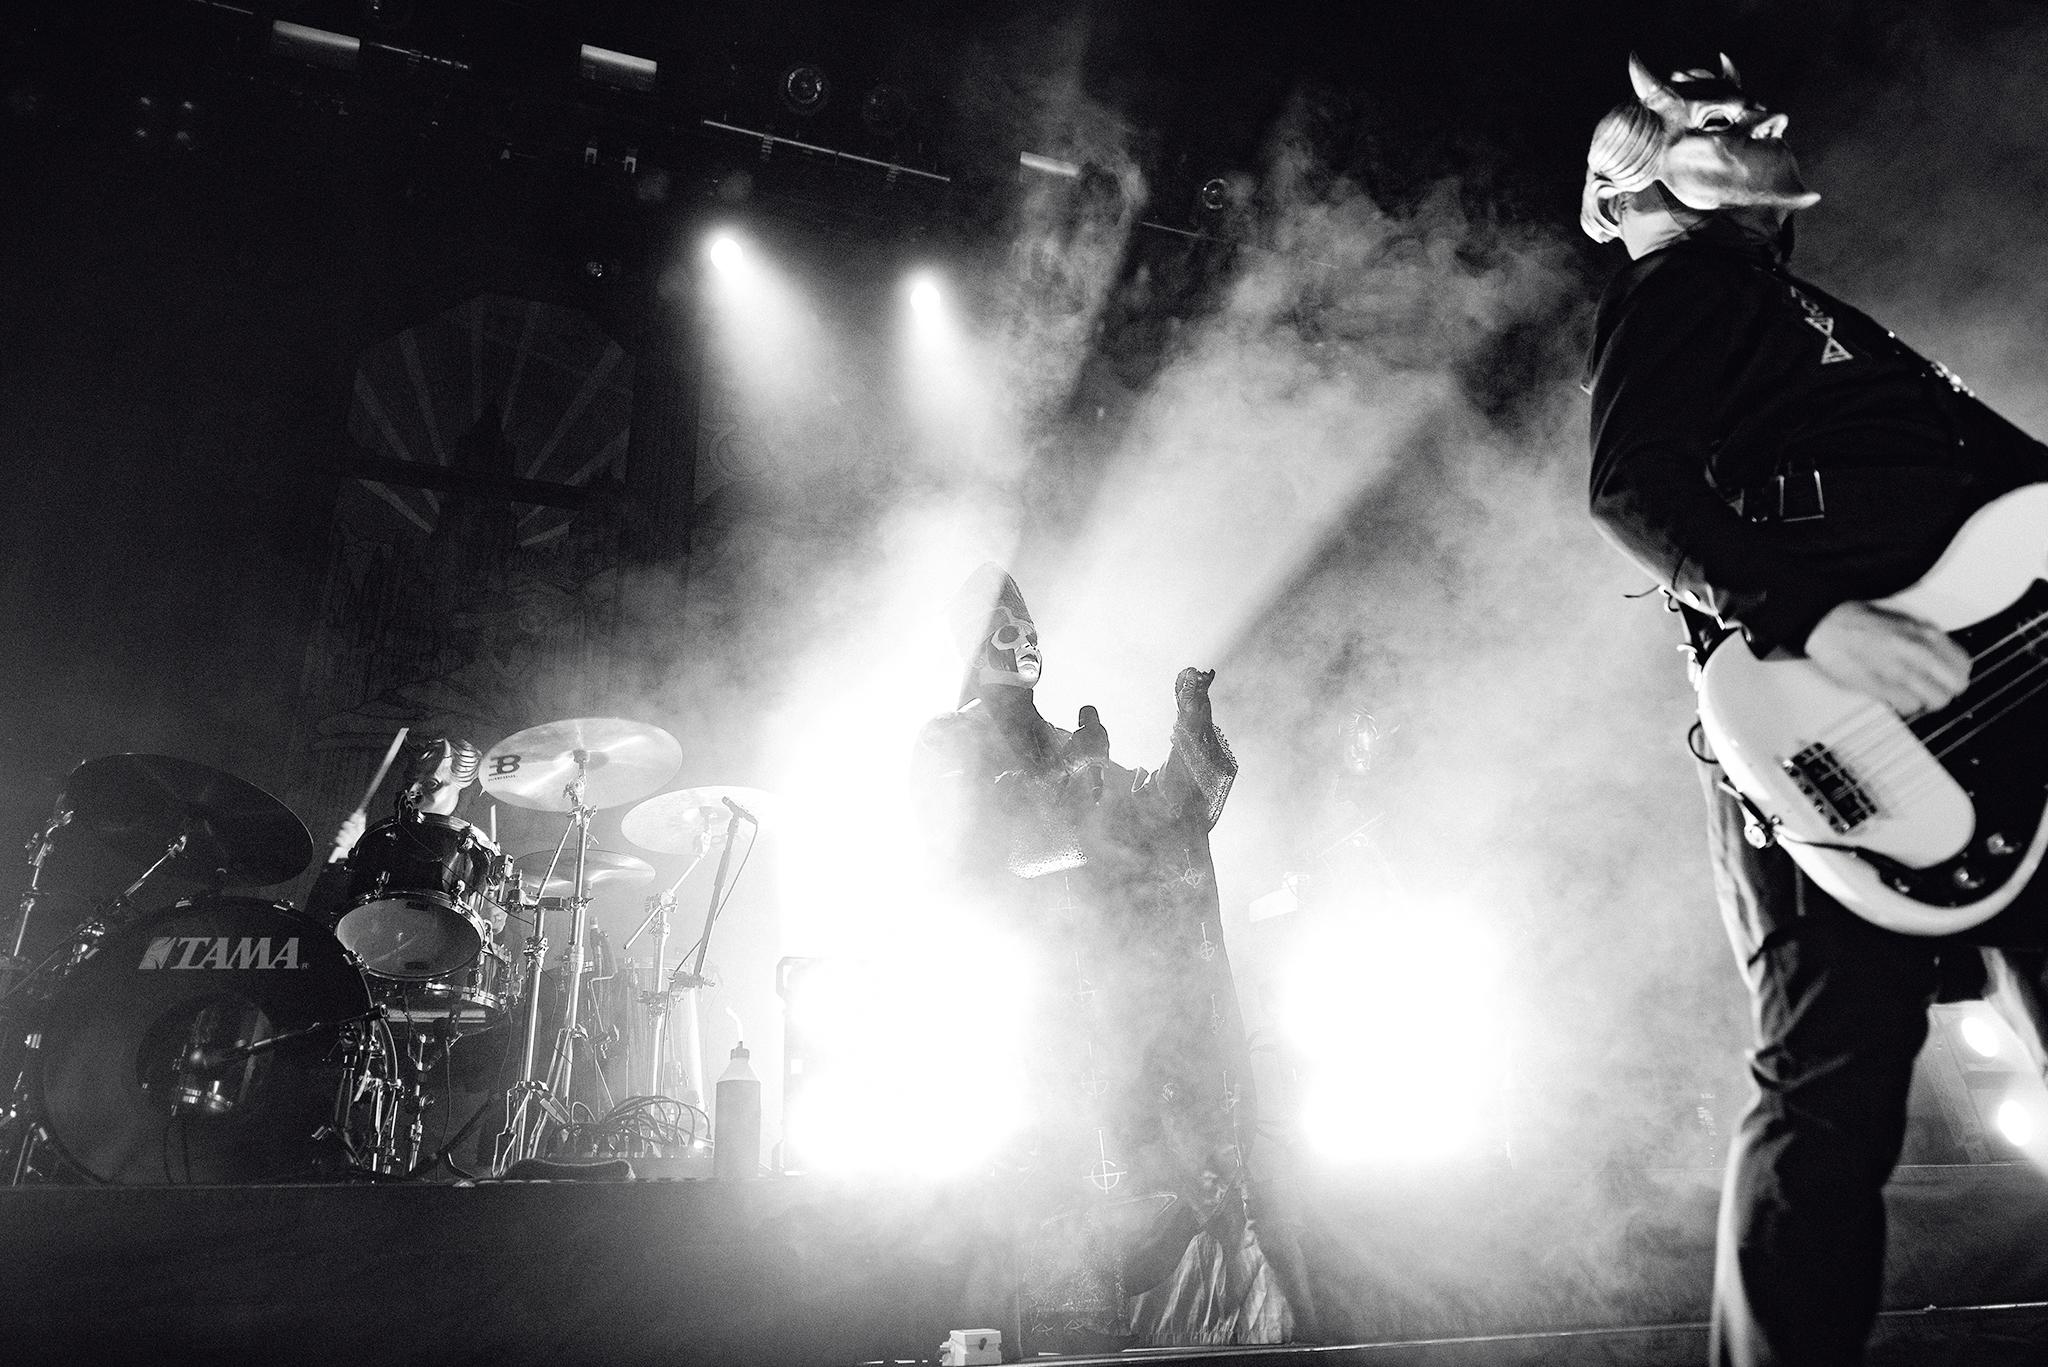 Ghost-Emos-Concert-Photography-Katrina-Barber-1.jpg